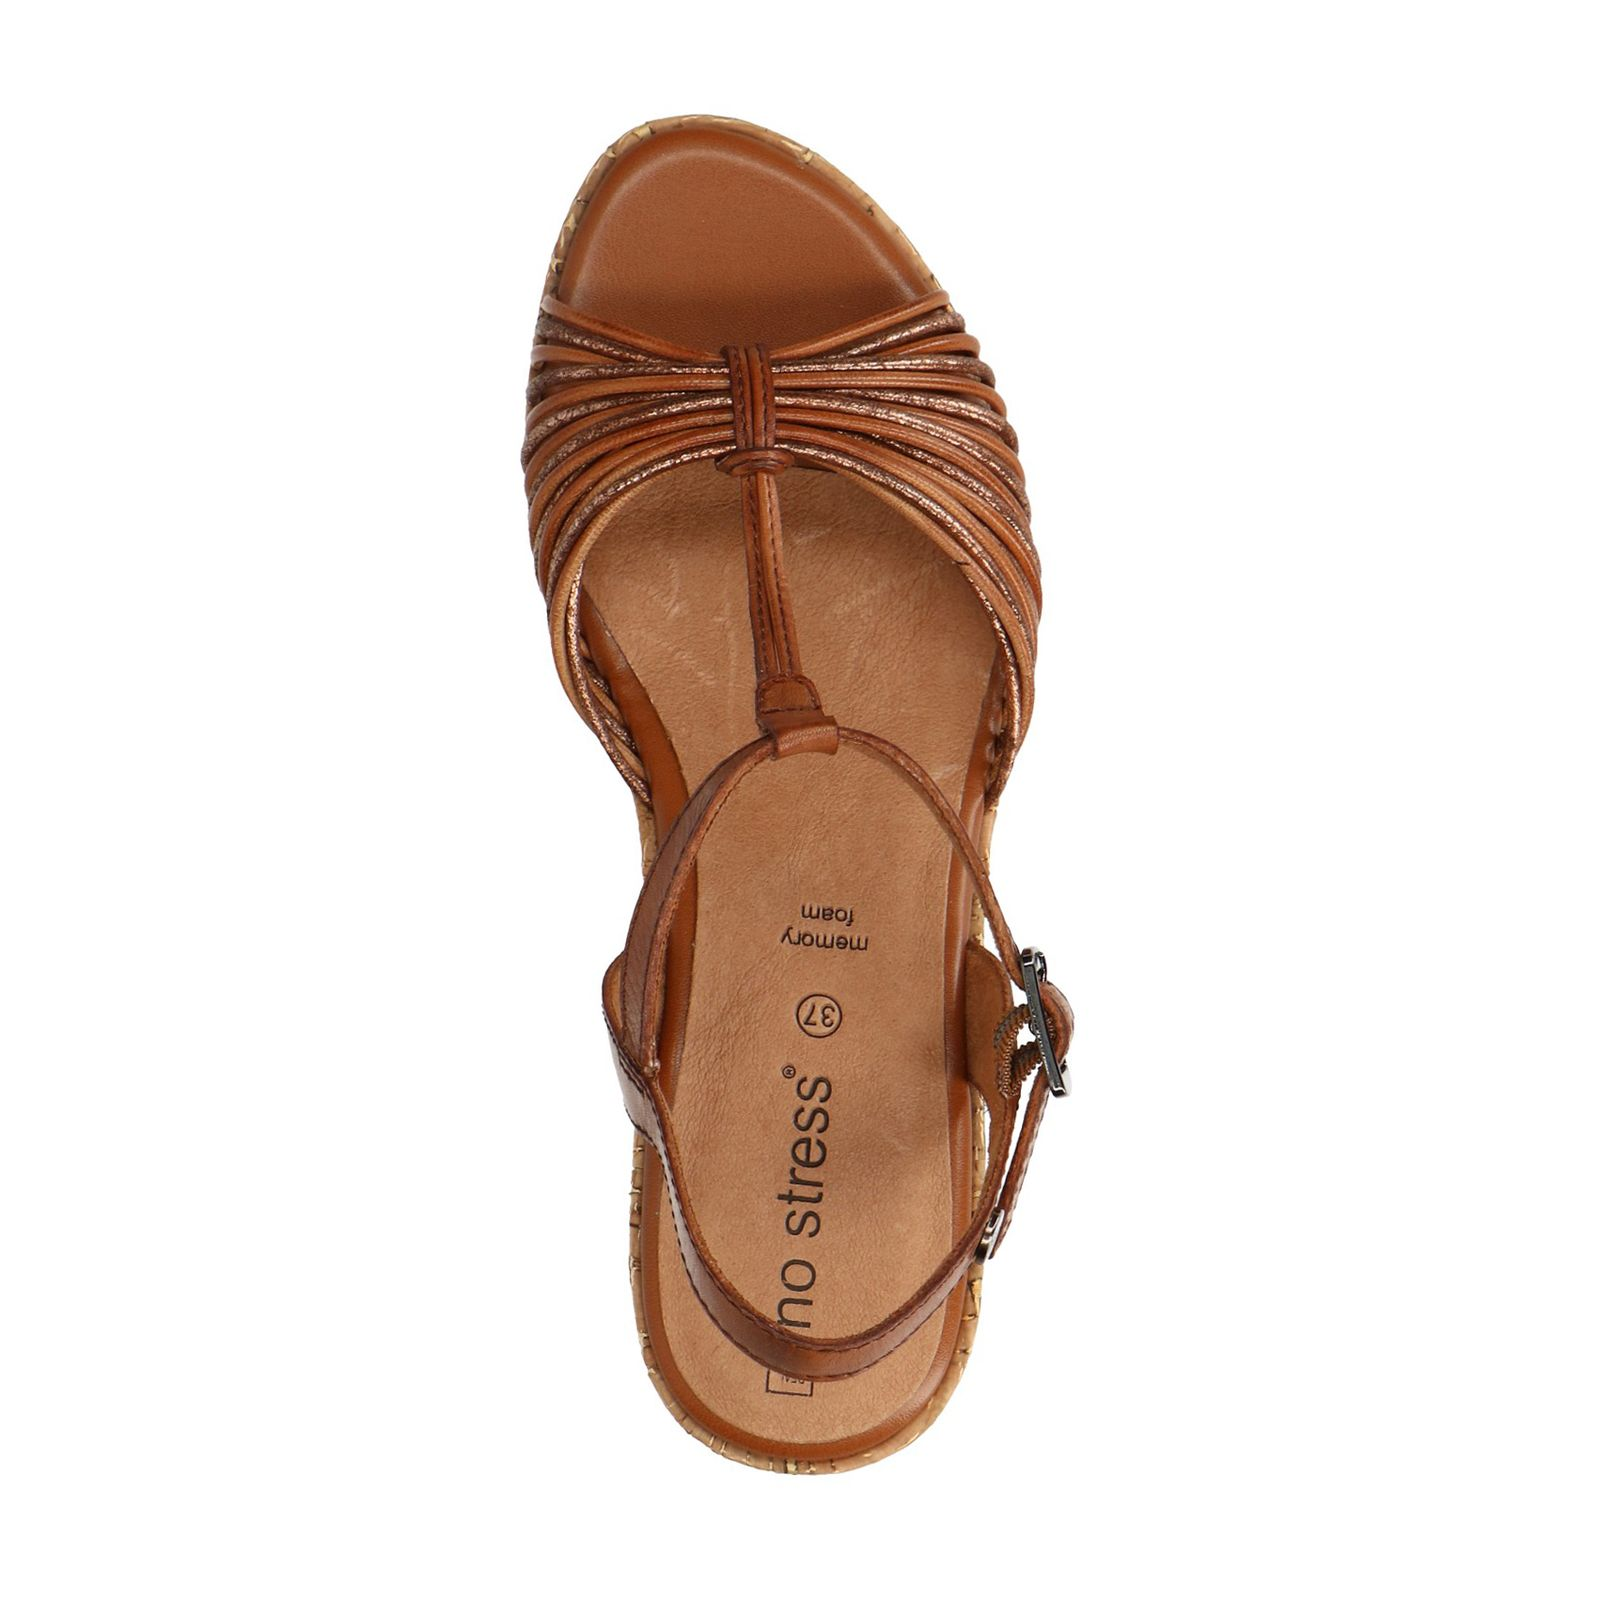 san francisco 1478c a993e Cognac sandalen met hak en kurkzool - Dames   MANFIELD